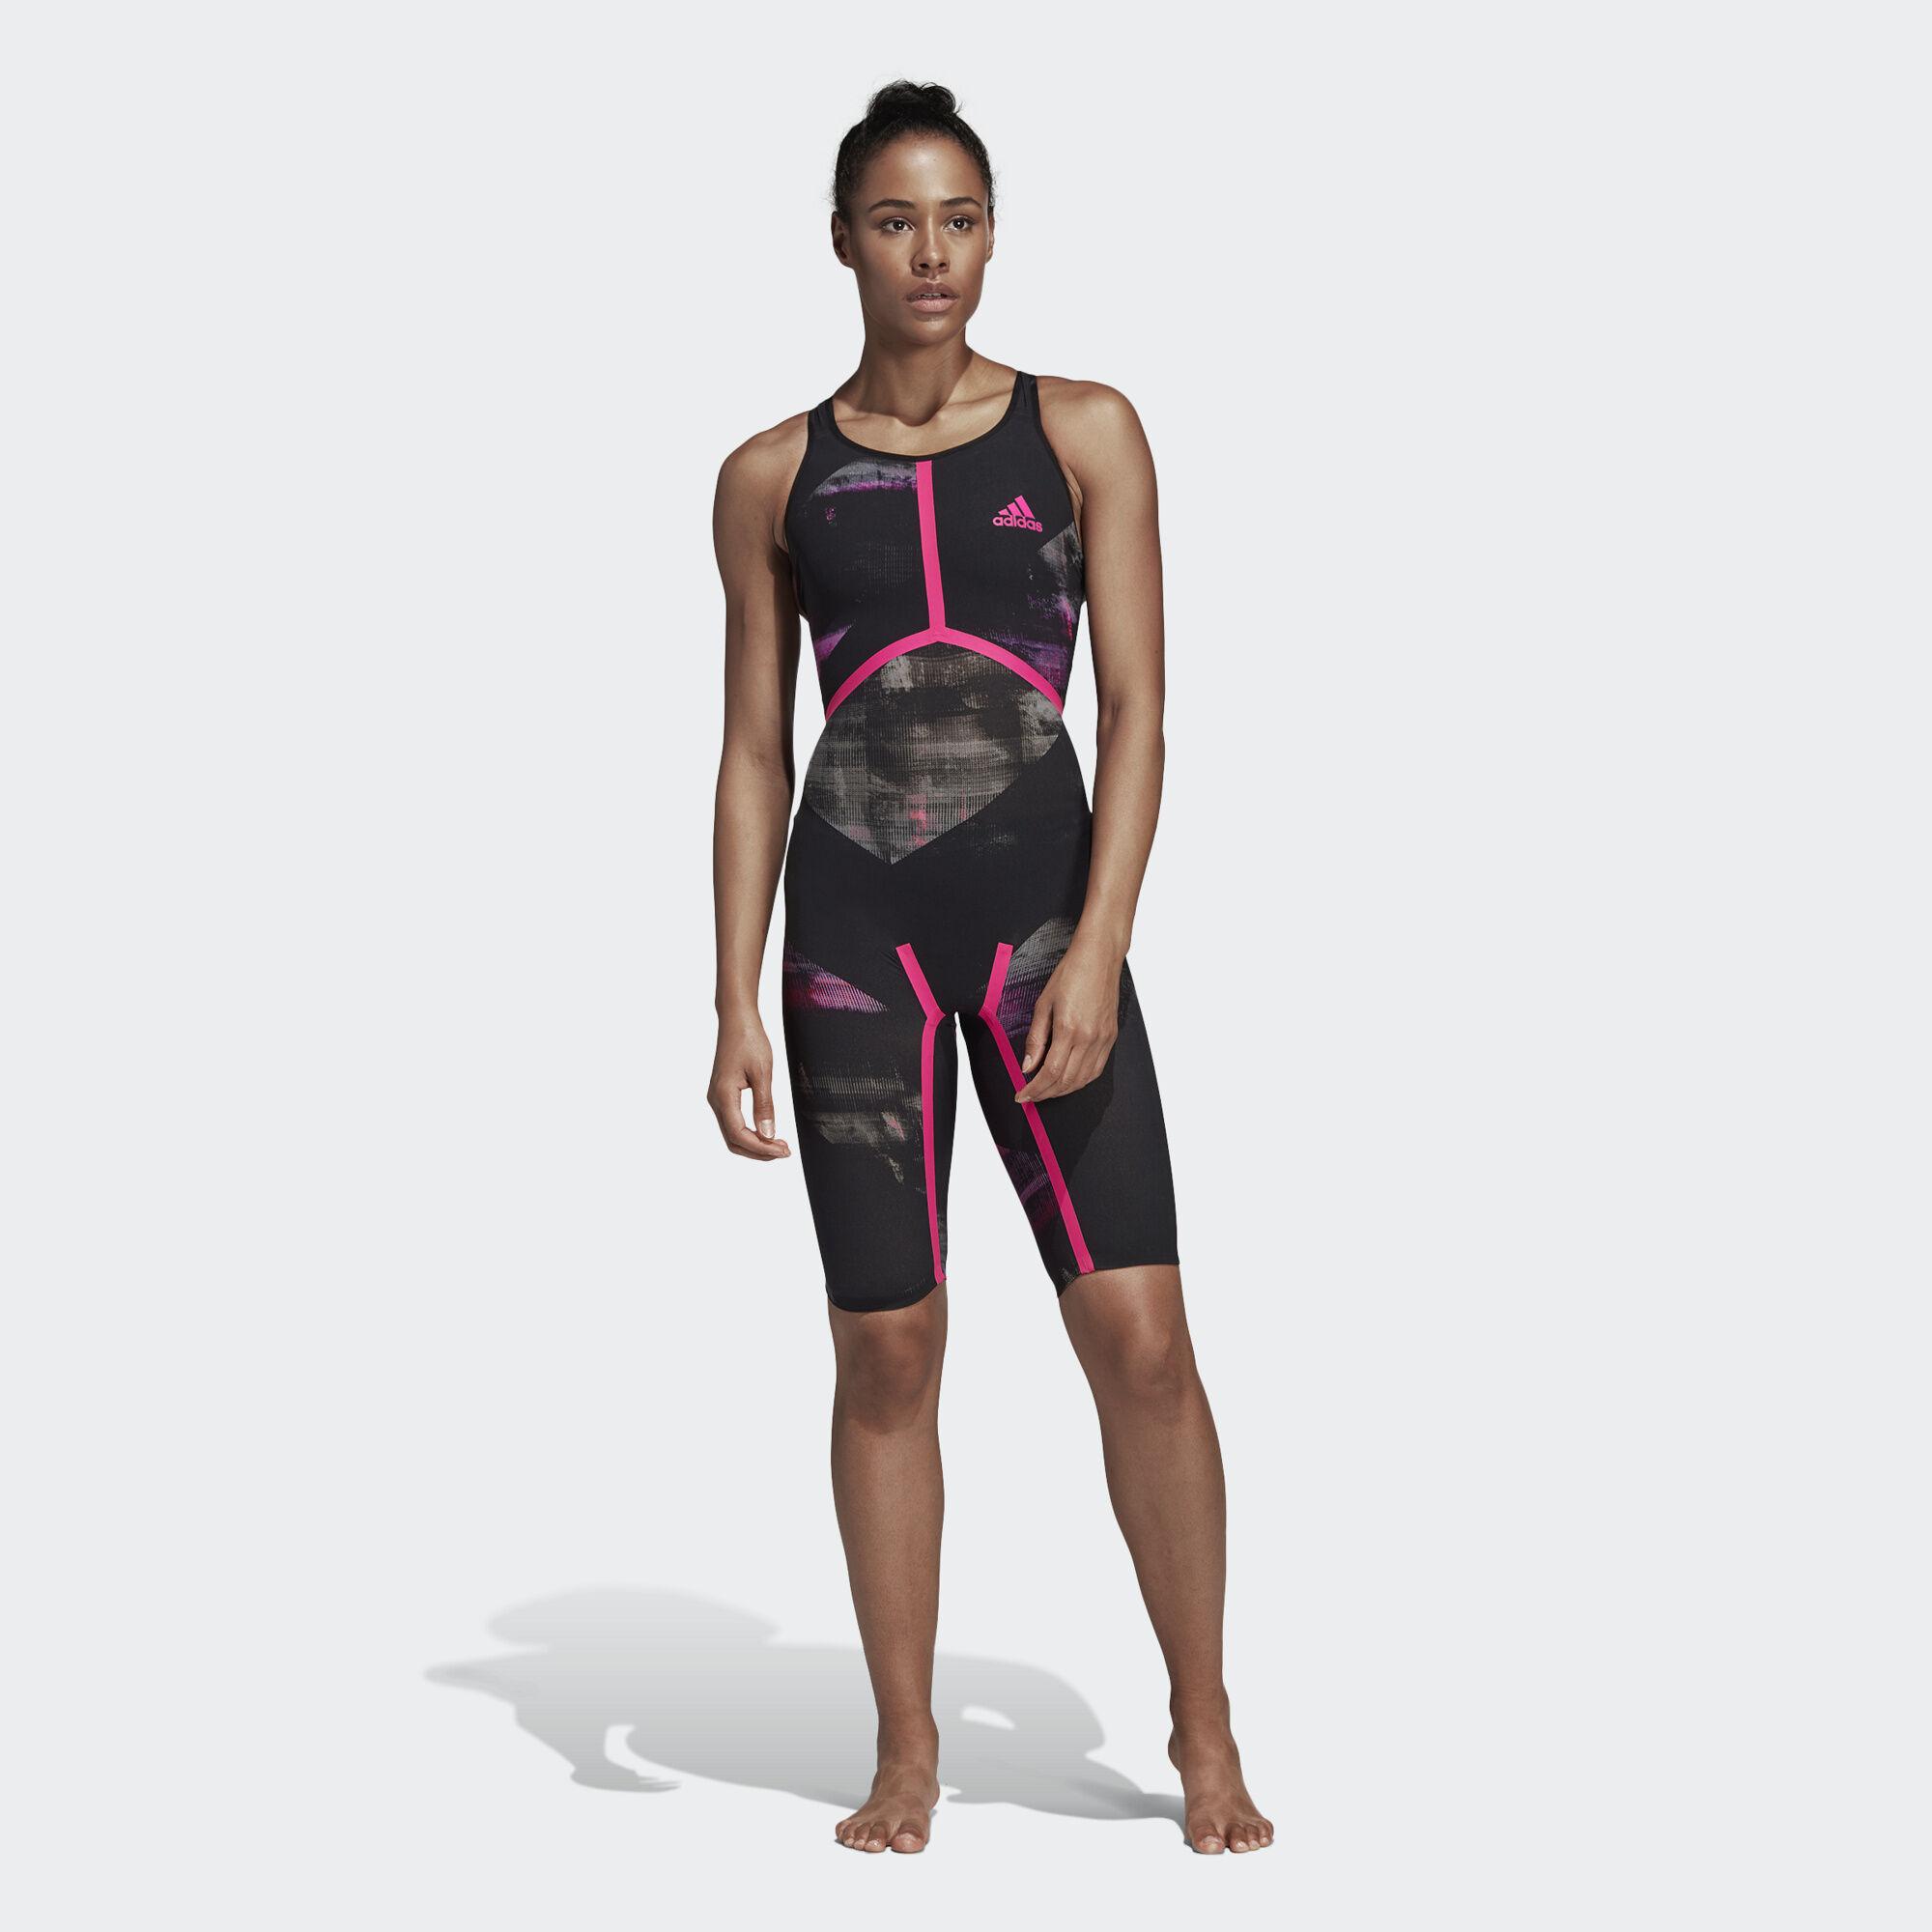 99f07ddb63858 adidas - Adizero XVIII Freestyle Swimsuit Black Shock Pink CD5235